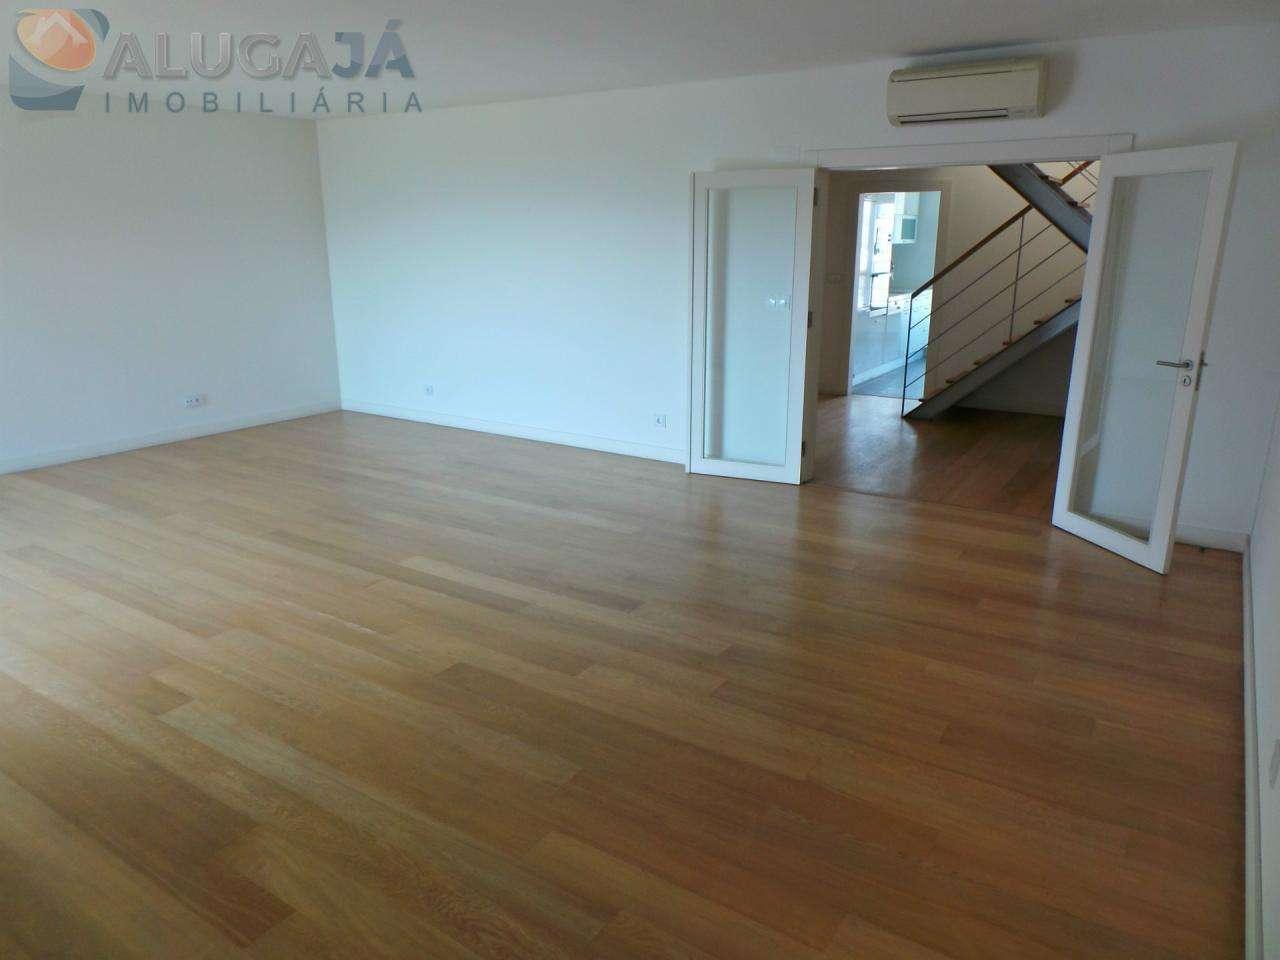 Apartamento para comprar, Belém, Lisboa - Foto 8